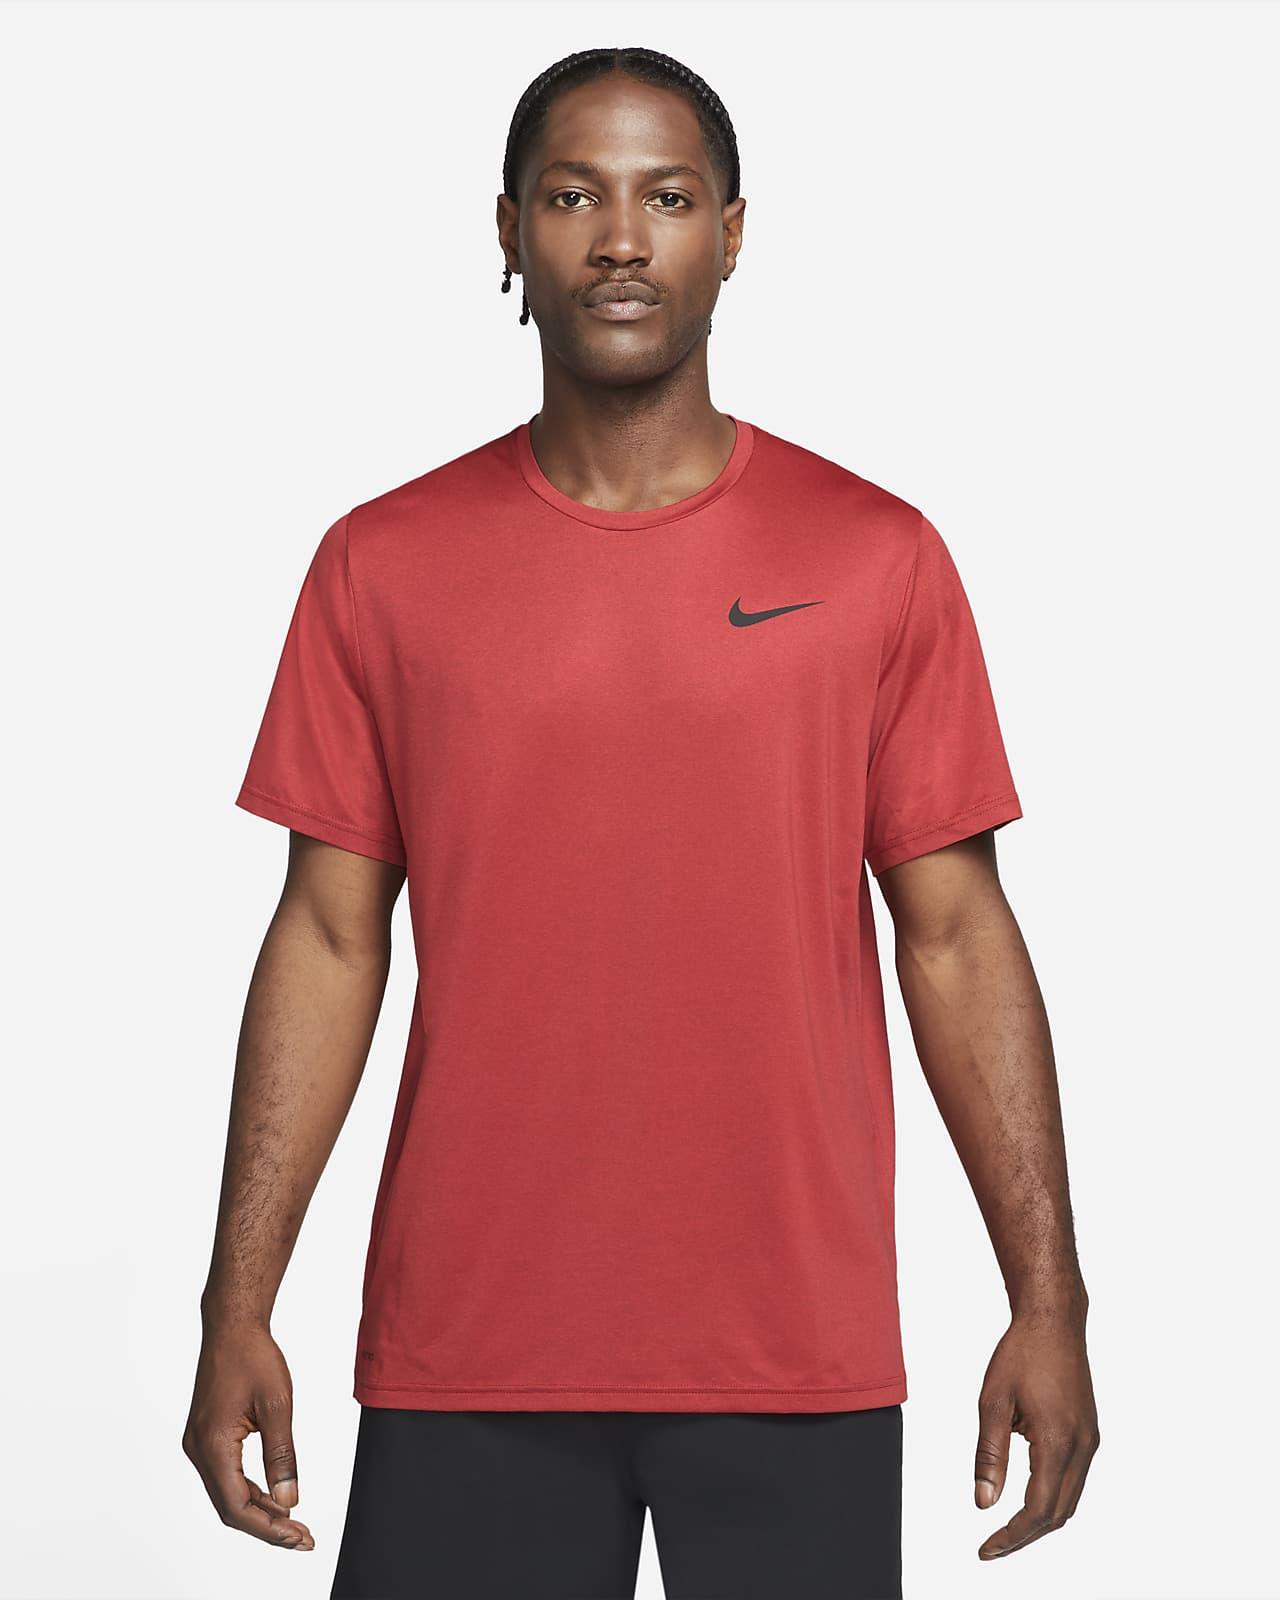 Nike Pro Dri-FIT Men's Short-Sleeve Top